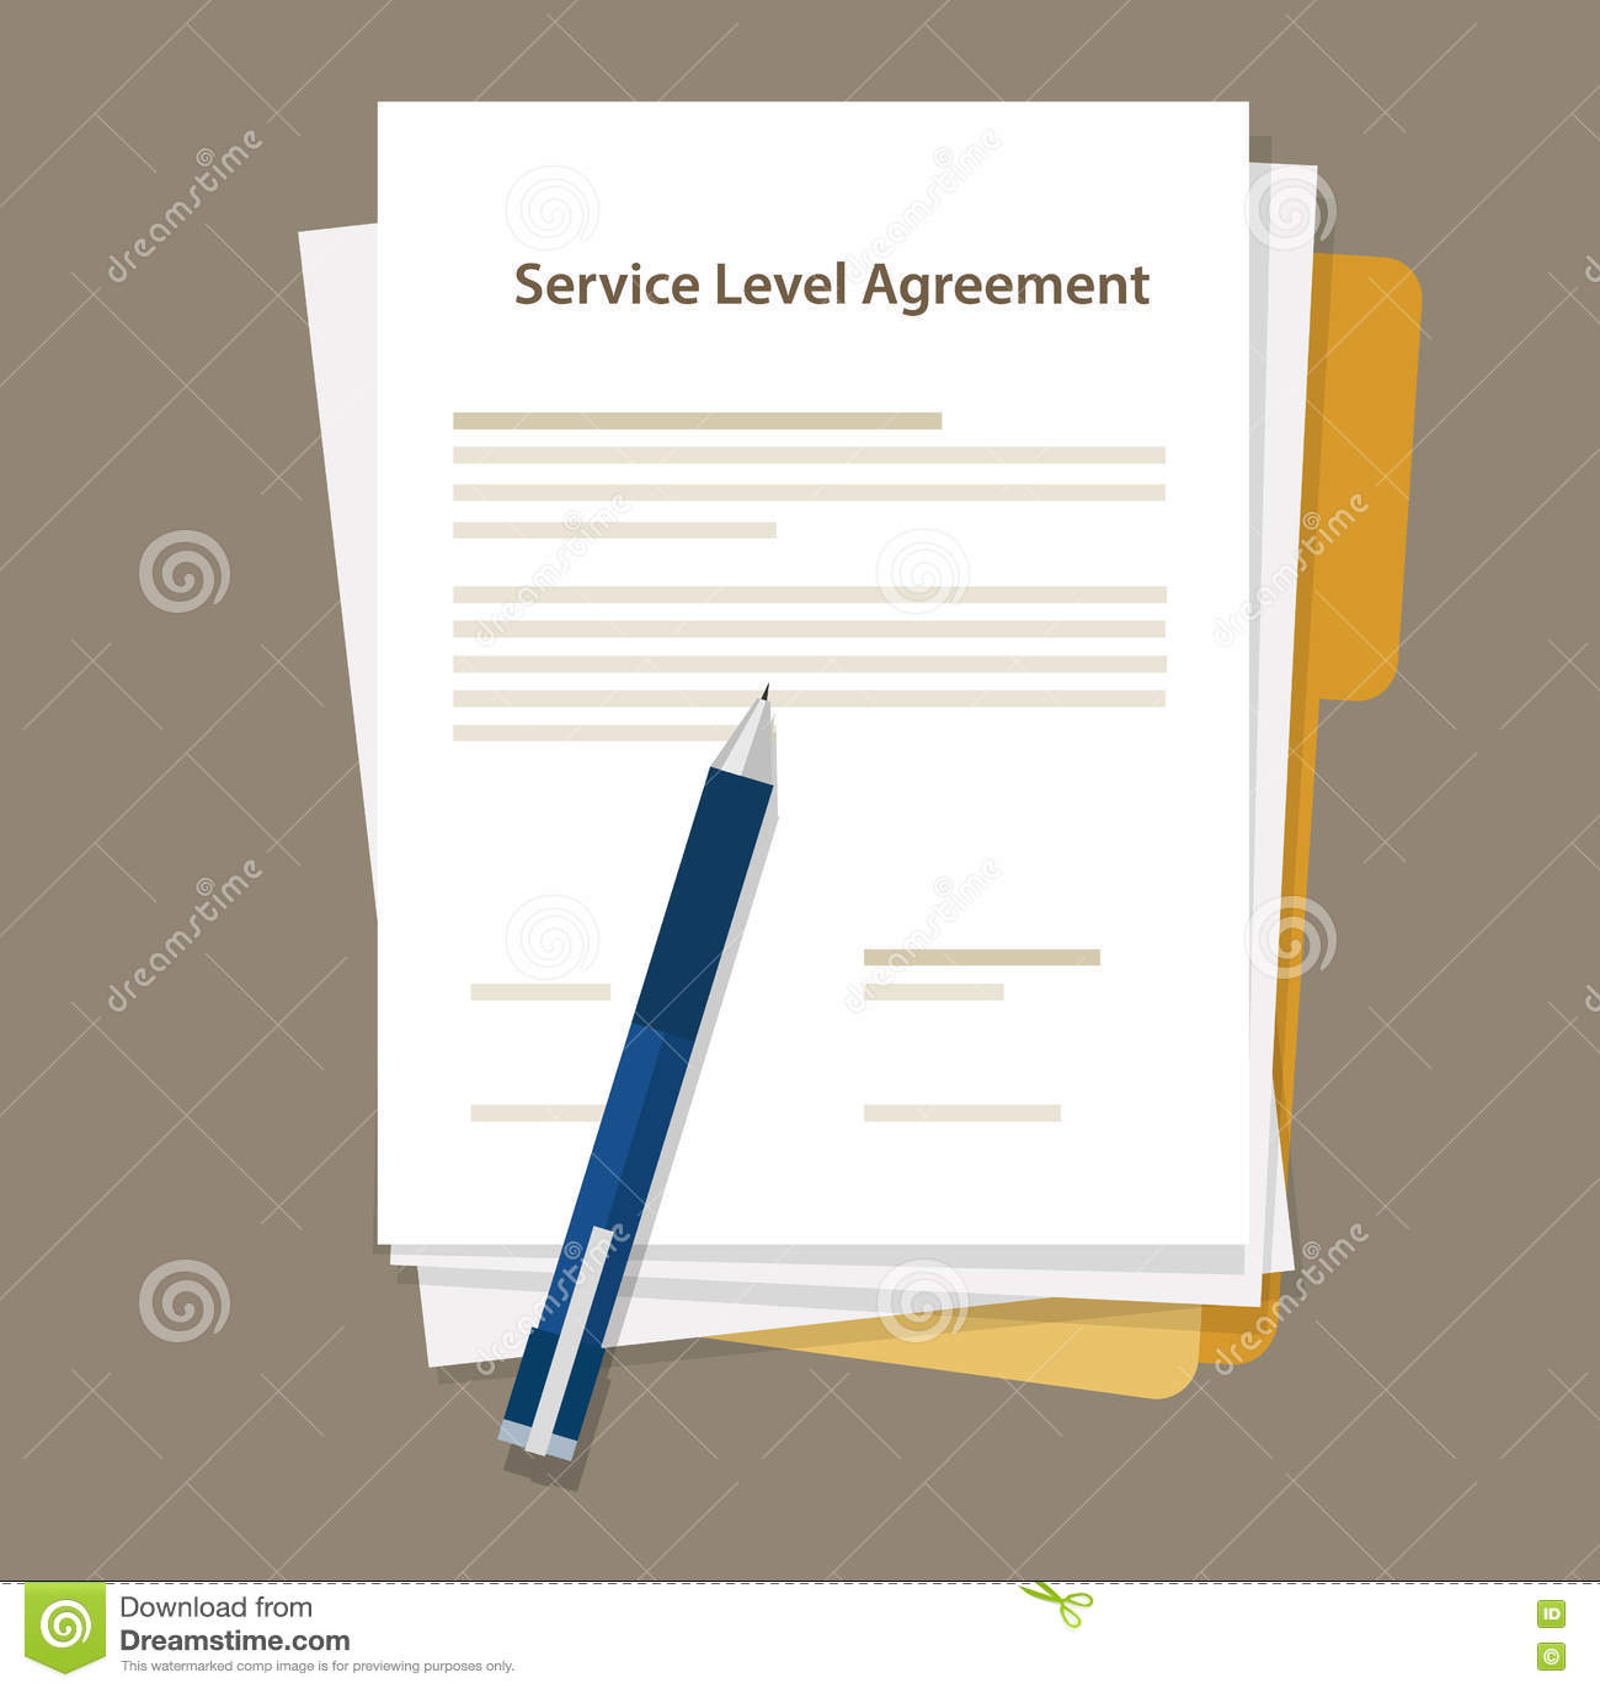 Sla Service Level Agreement Document Pen Paper Stock Vector